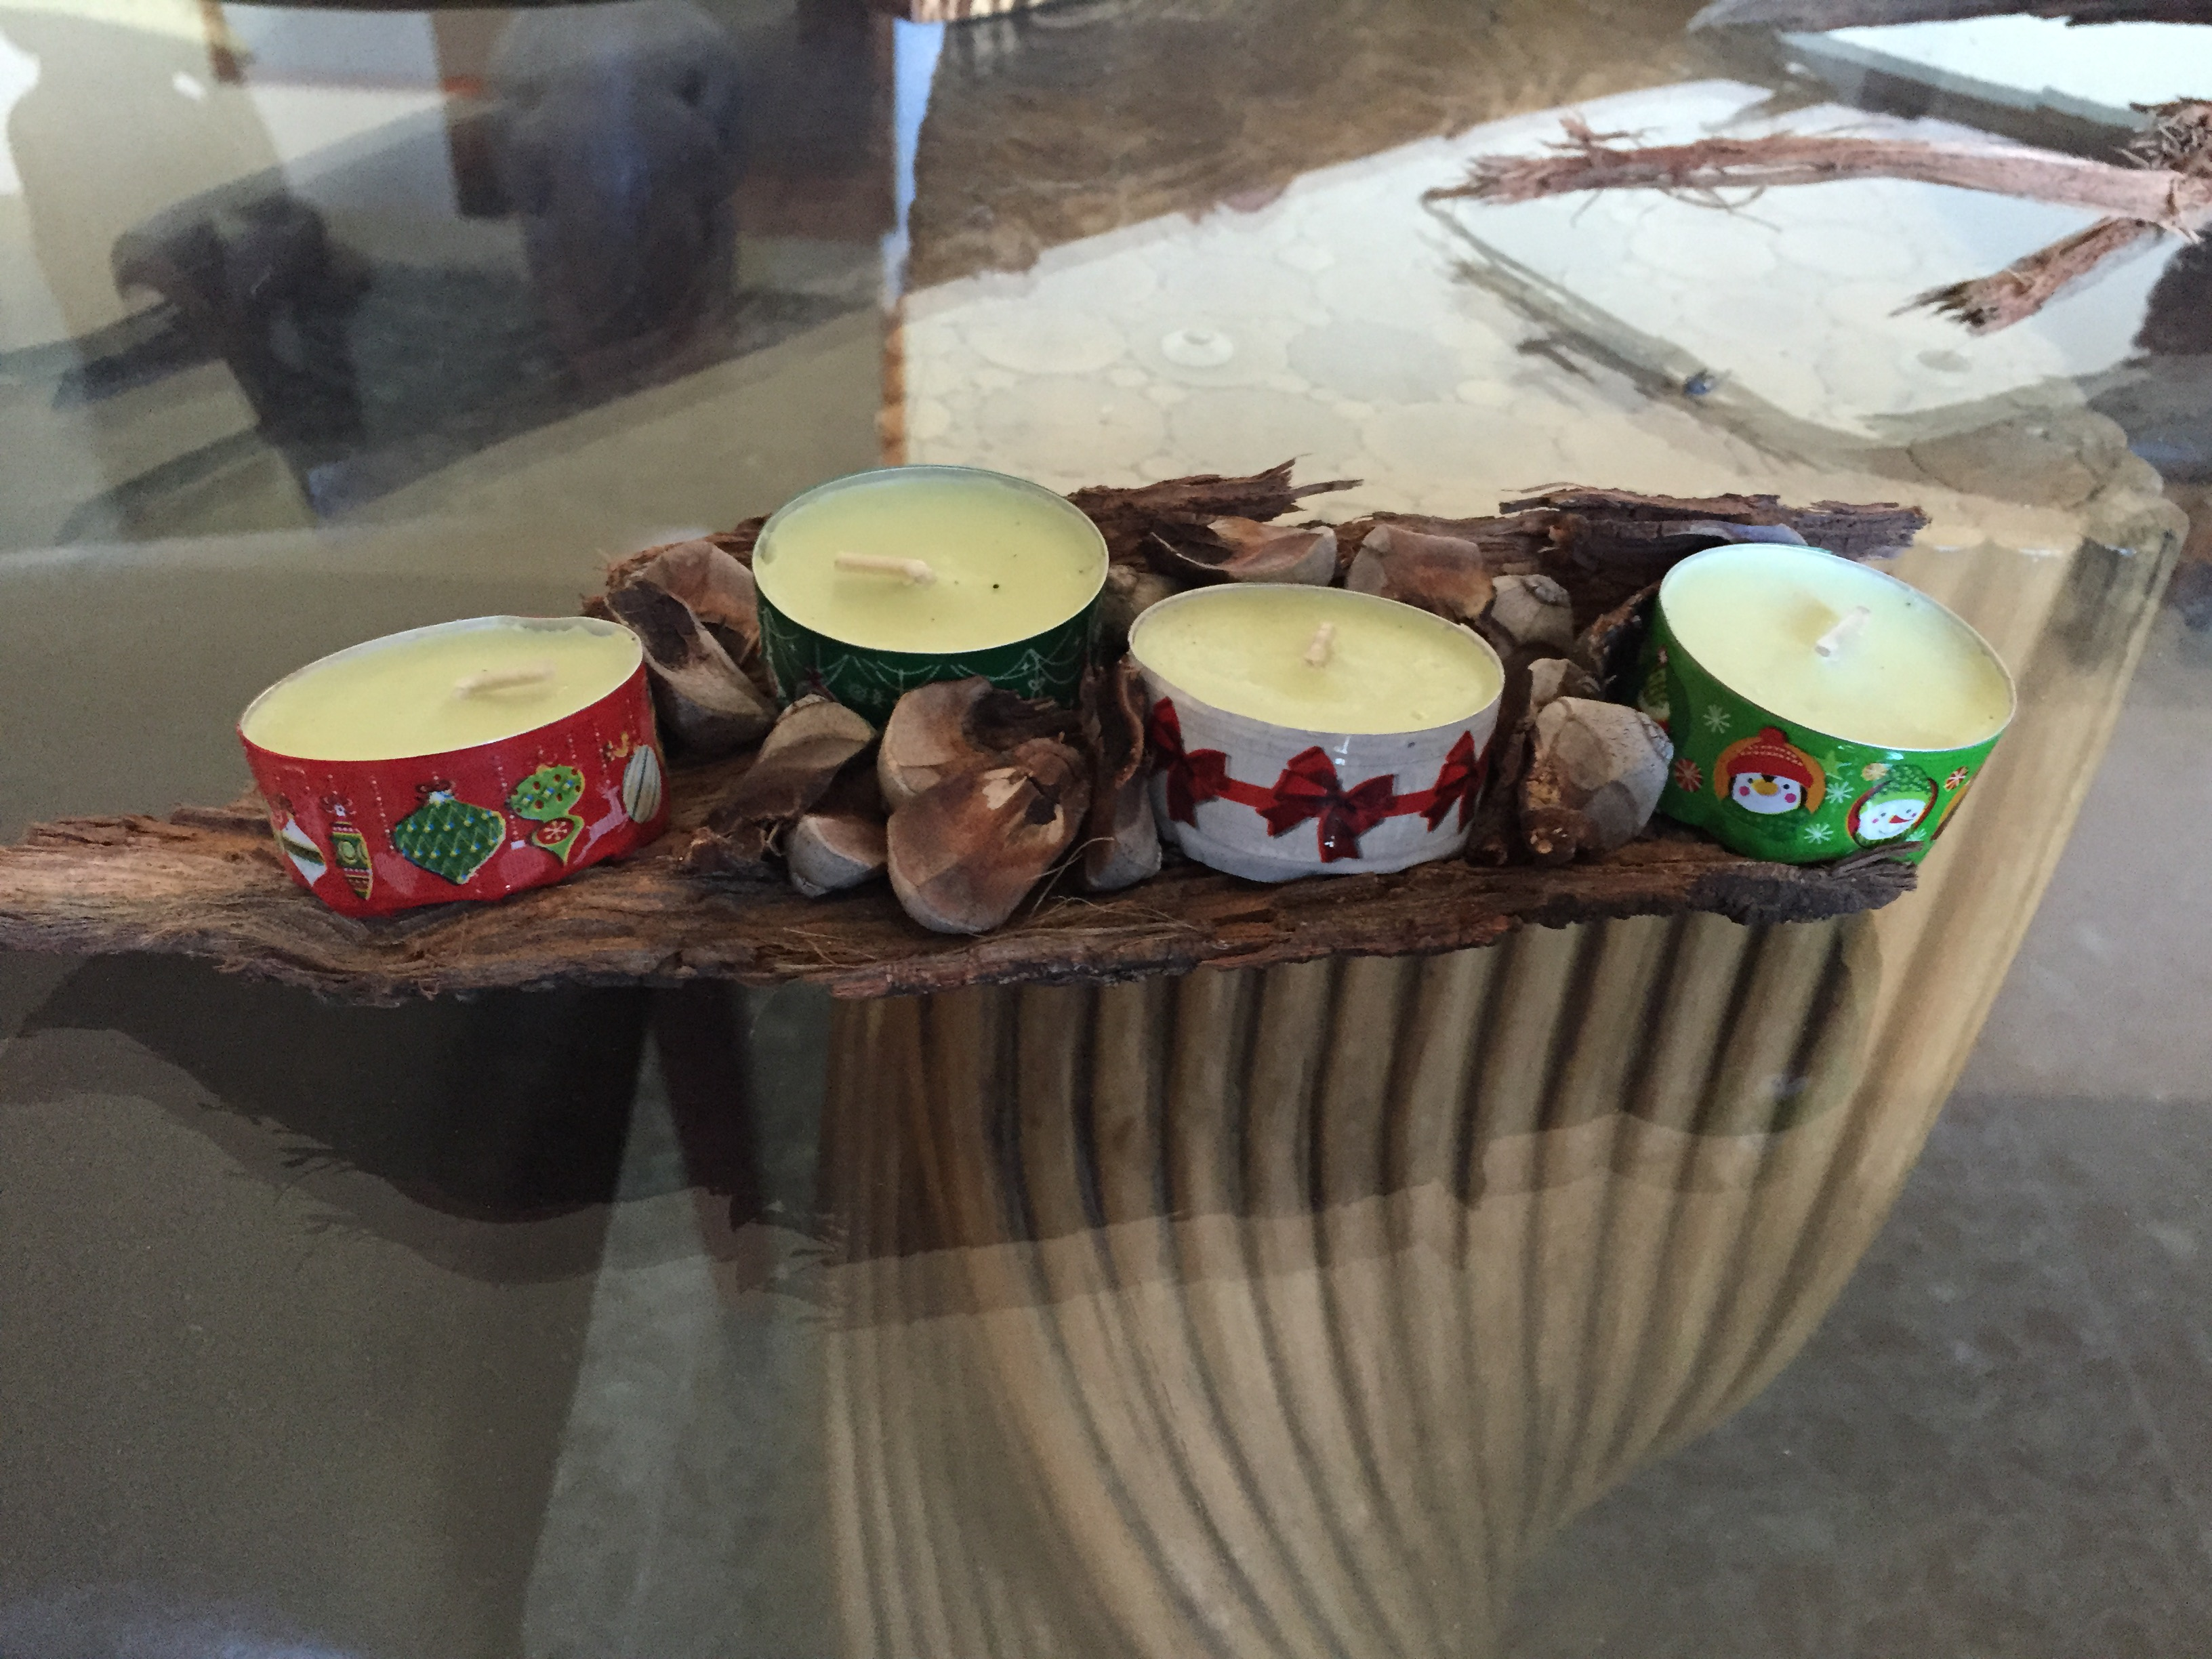 Centros de mesa con velas clarimanitas for Centro mesa navidad manualidades